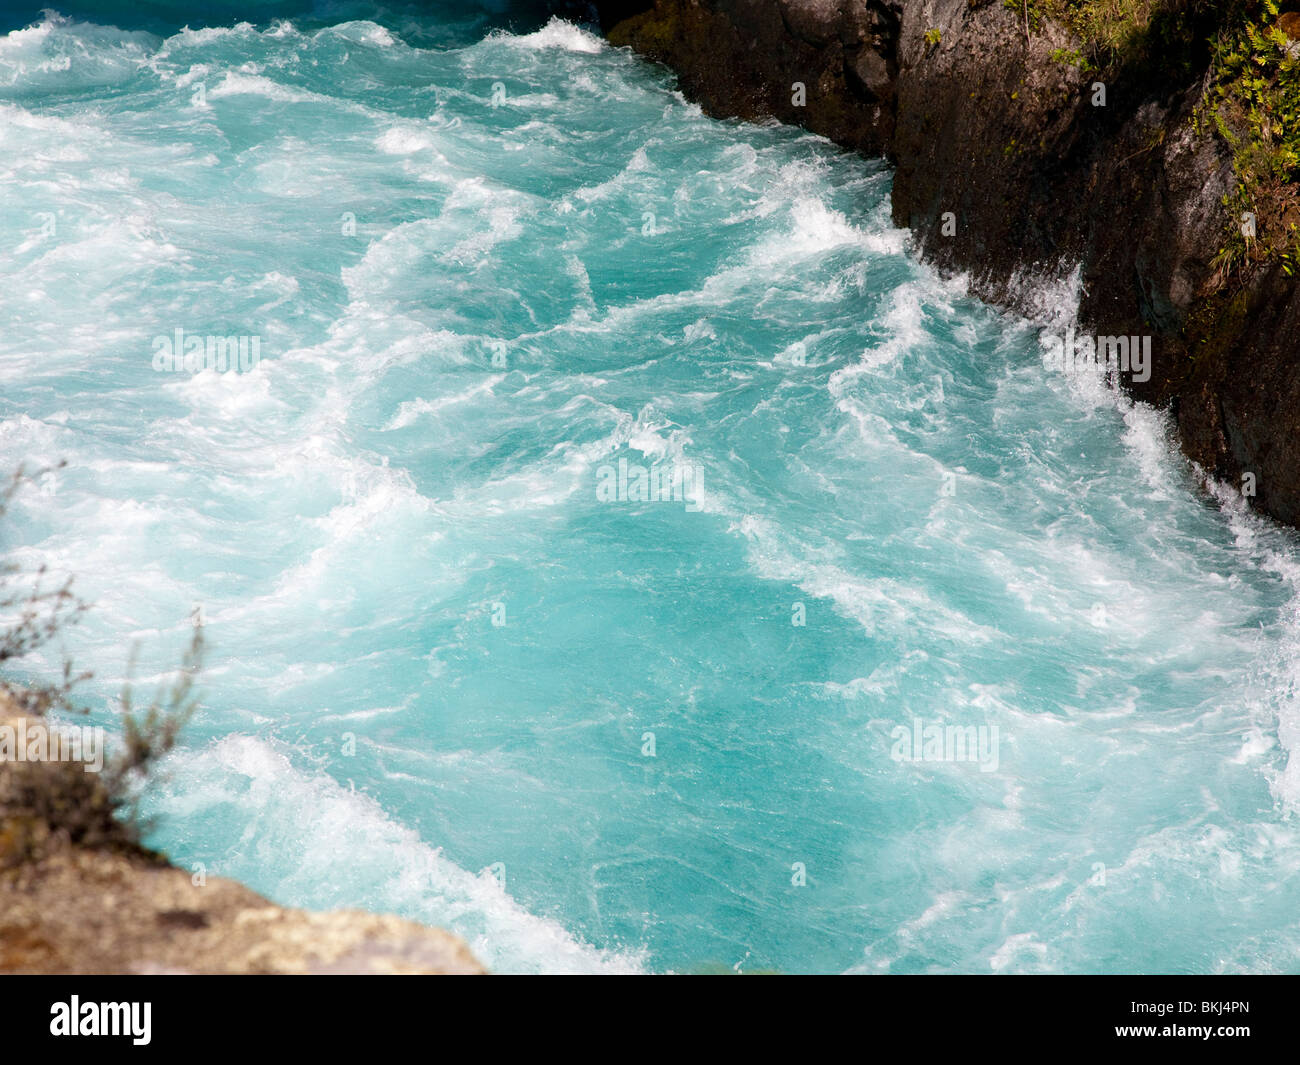 Huka Falls on the Waikato River near Taupo - Stock Image